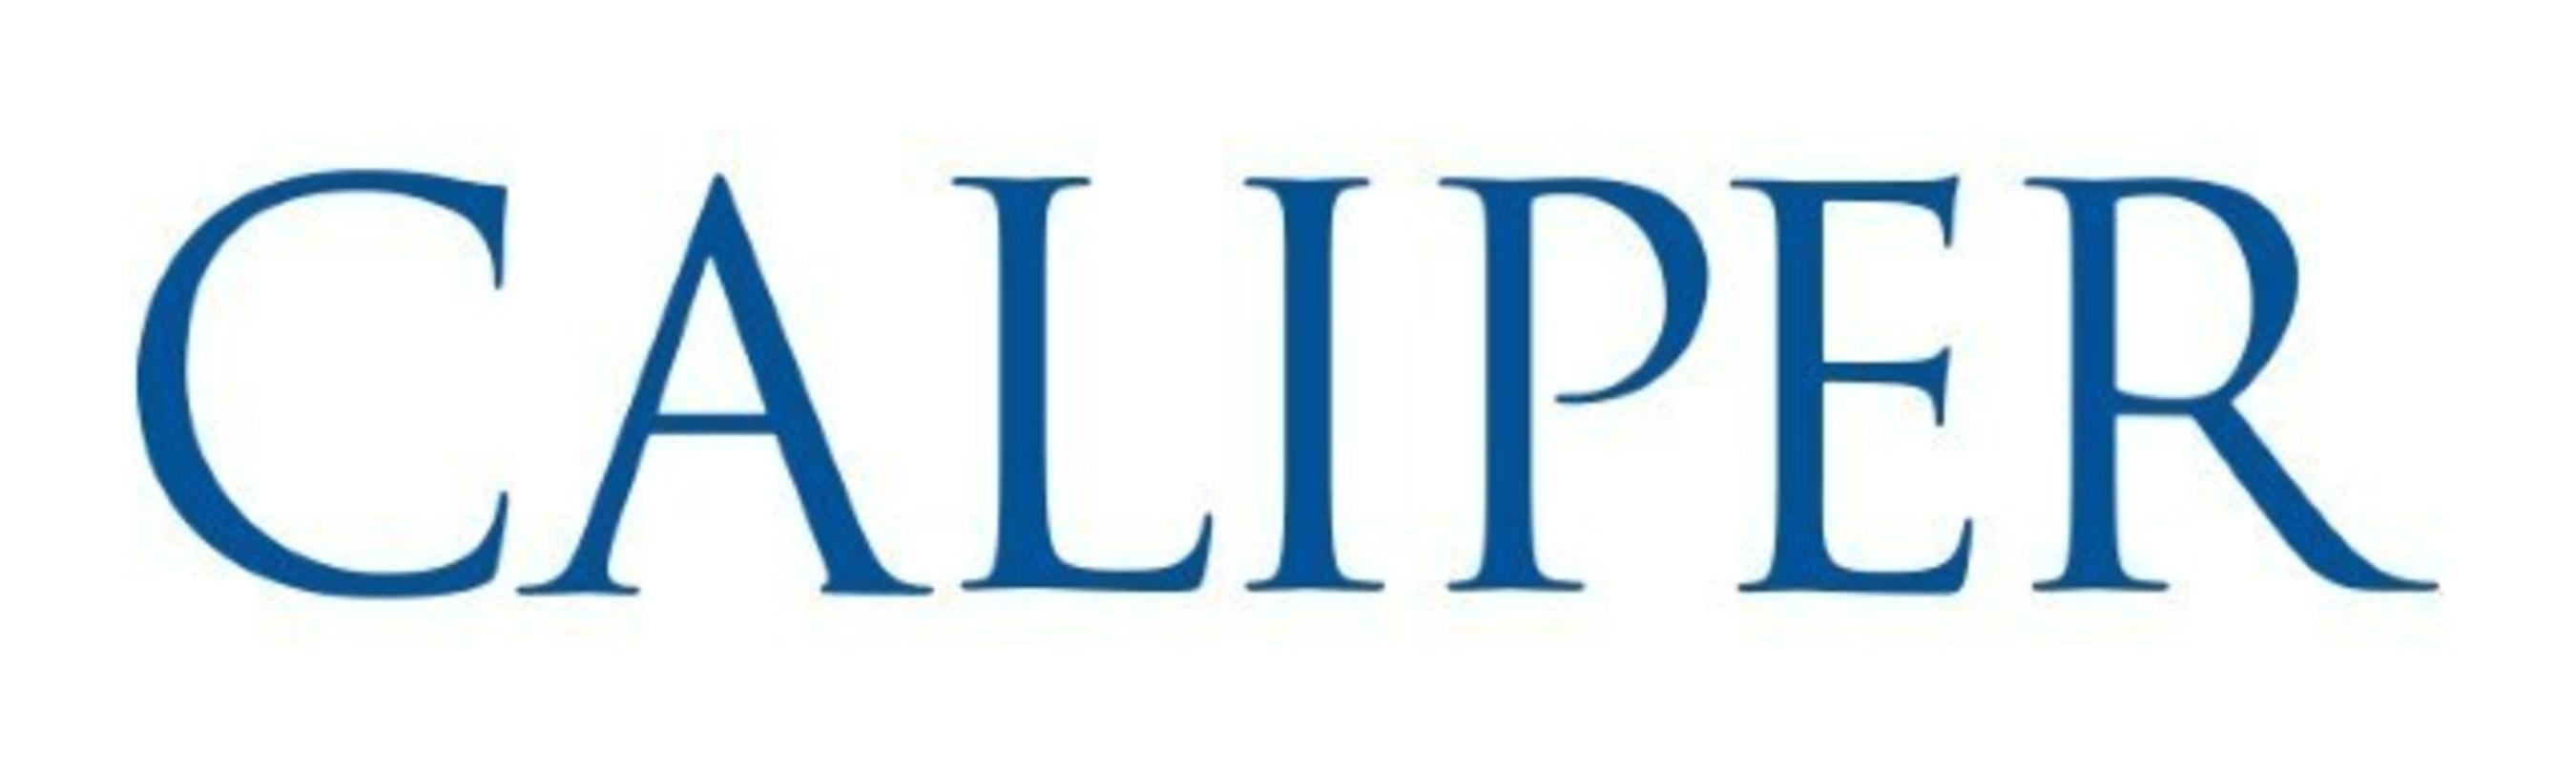 CALIPER Launches Caliper Analytics™ for Dynamic, Data-Driven Talent Management